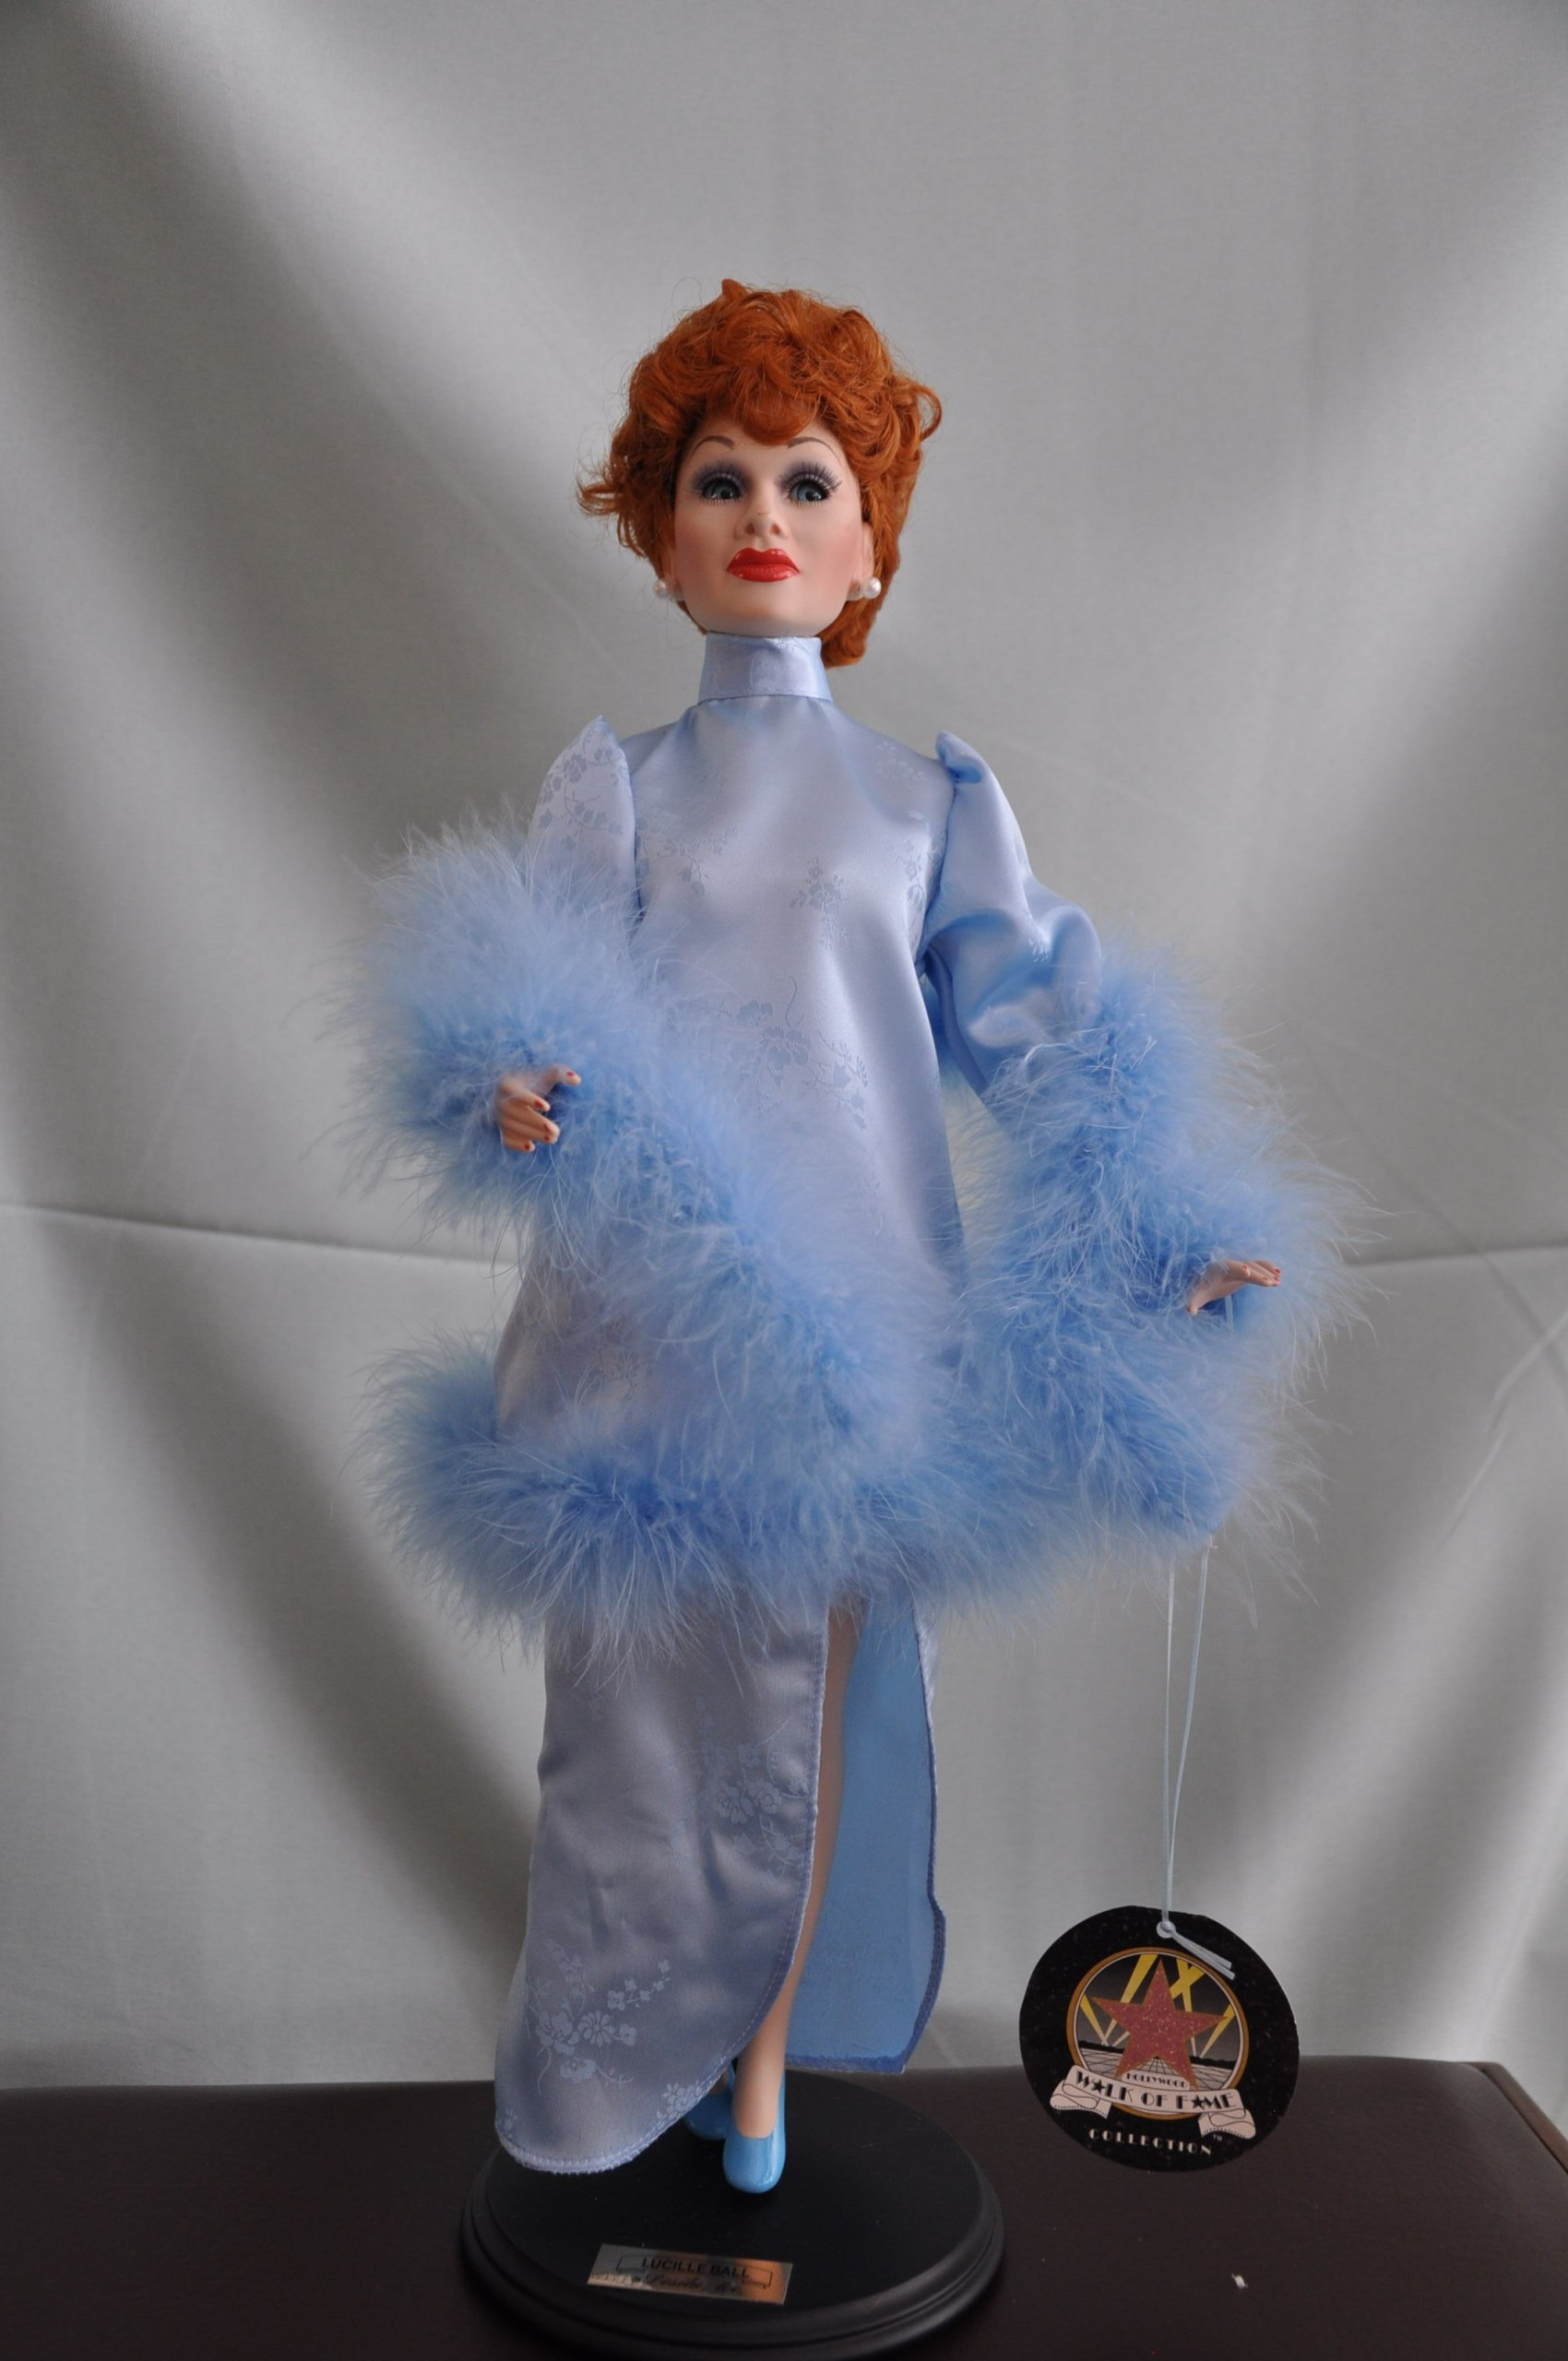 Porcelánová bábika Lucille Ball